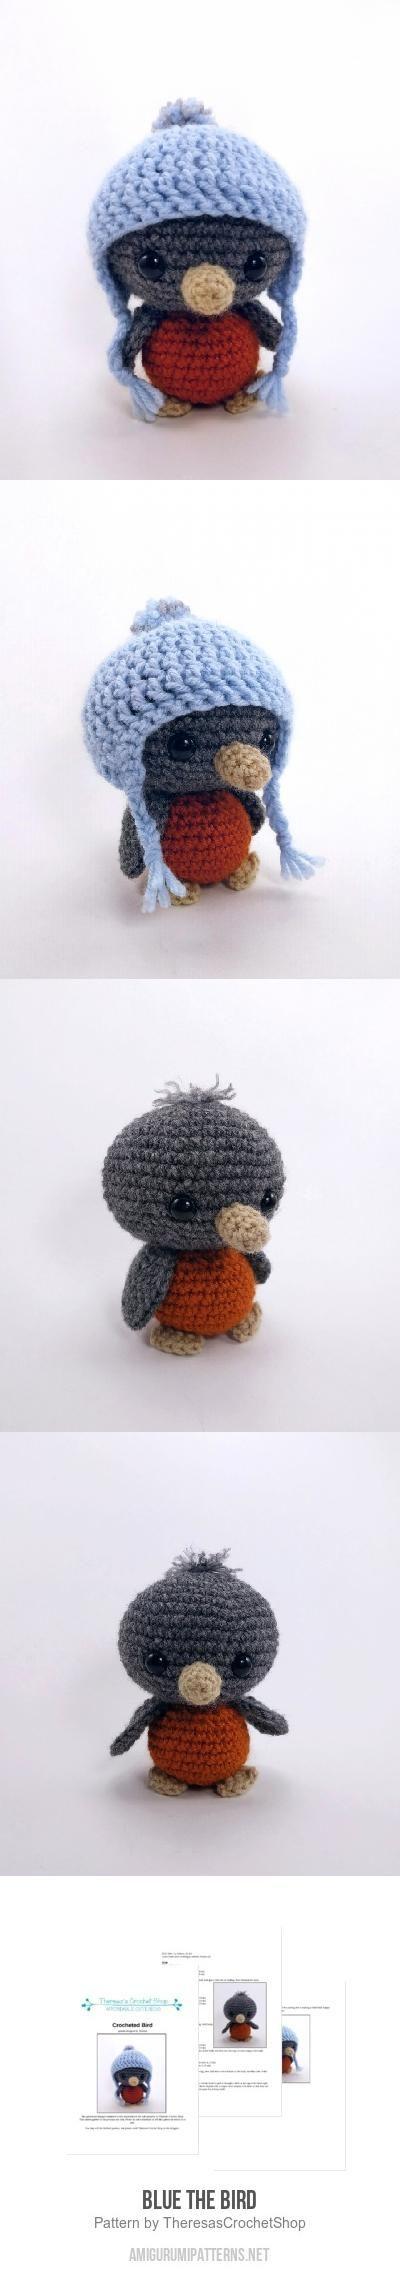 Blue The Bird Amigurumi Pattern - crochet pattern - by Theresa's Crochet Shop